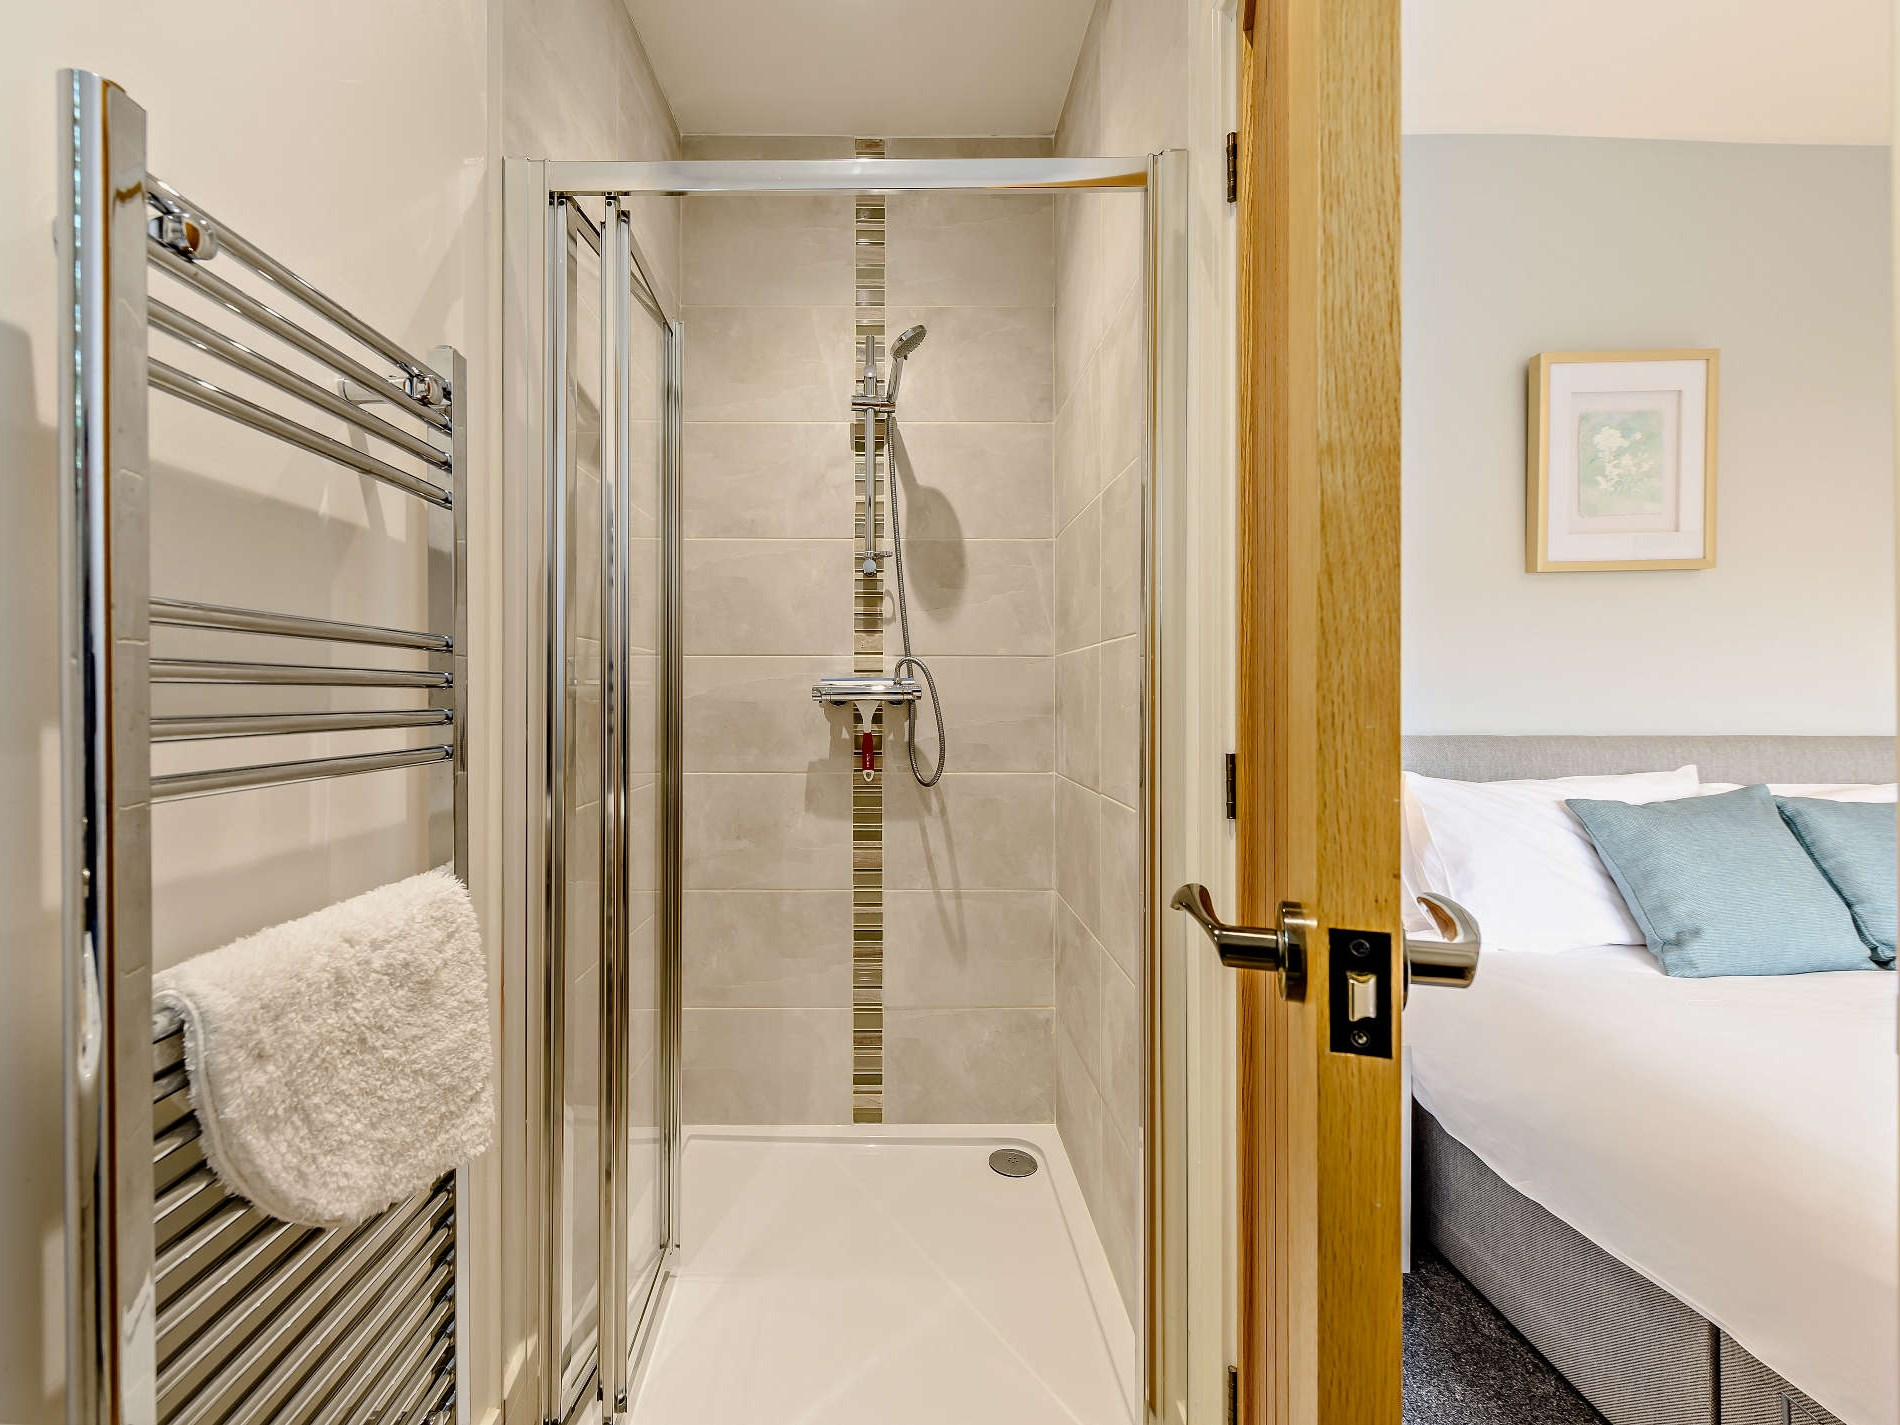 6 Bedroom House in North Devon, Devon